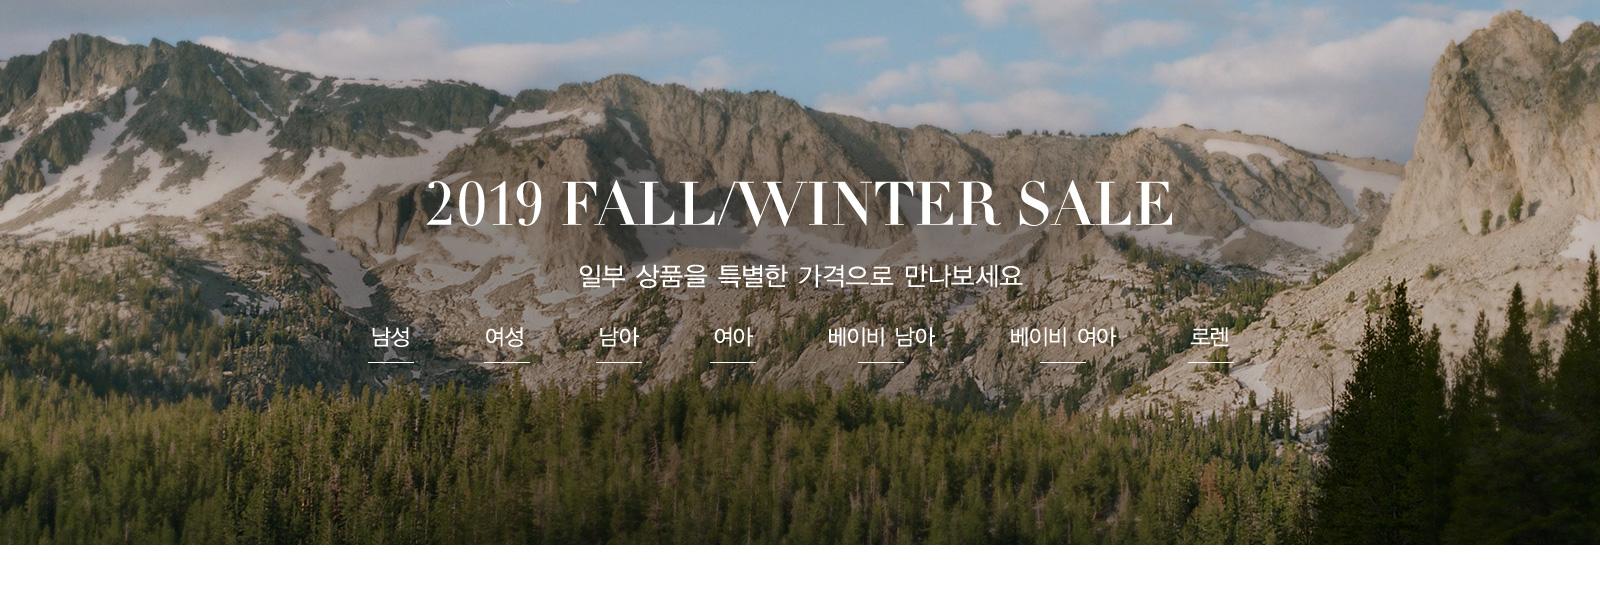 2019 FALL/WINTER SALE